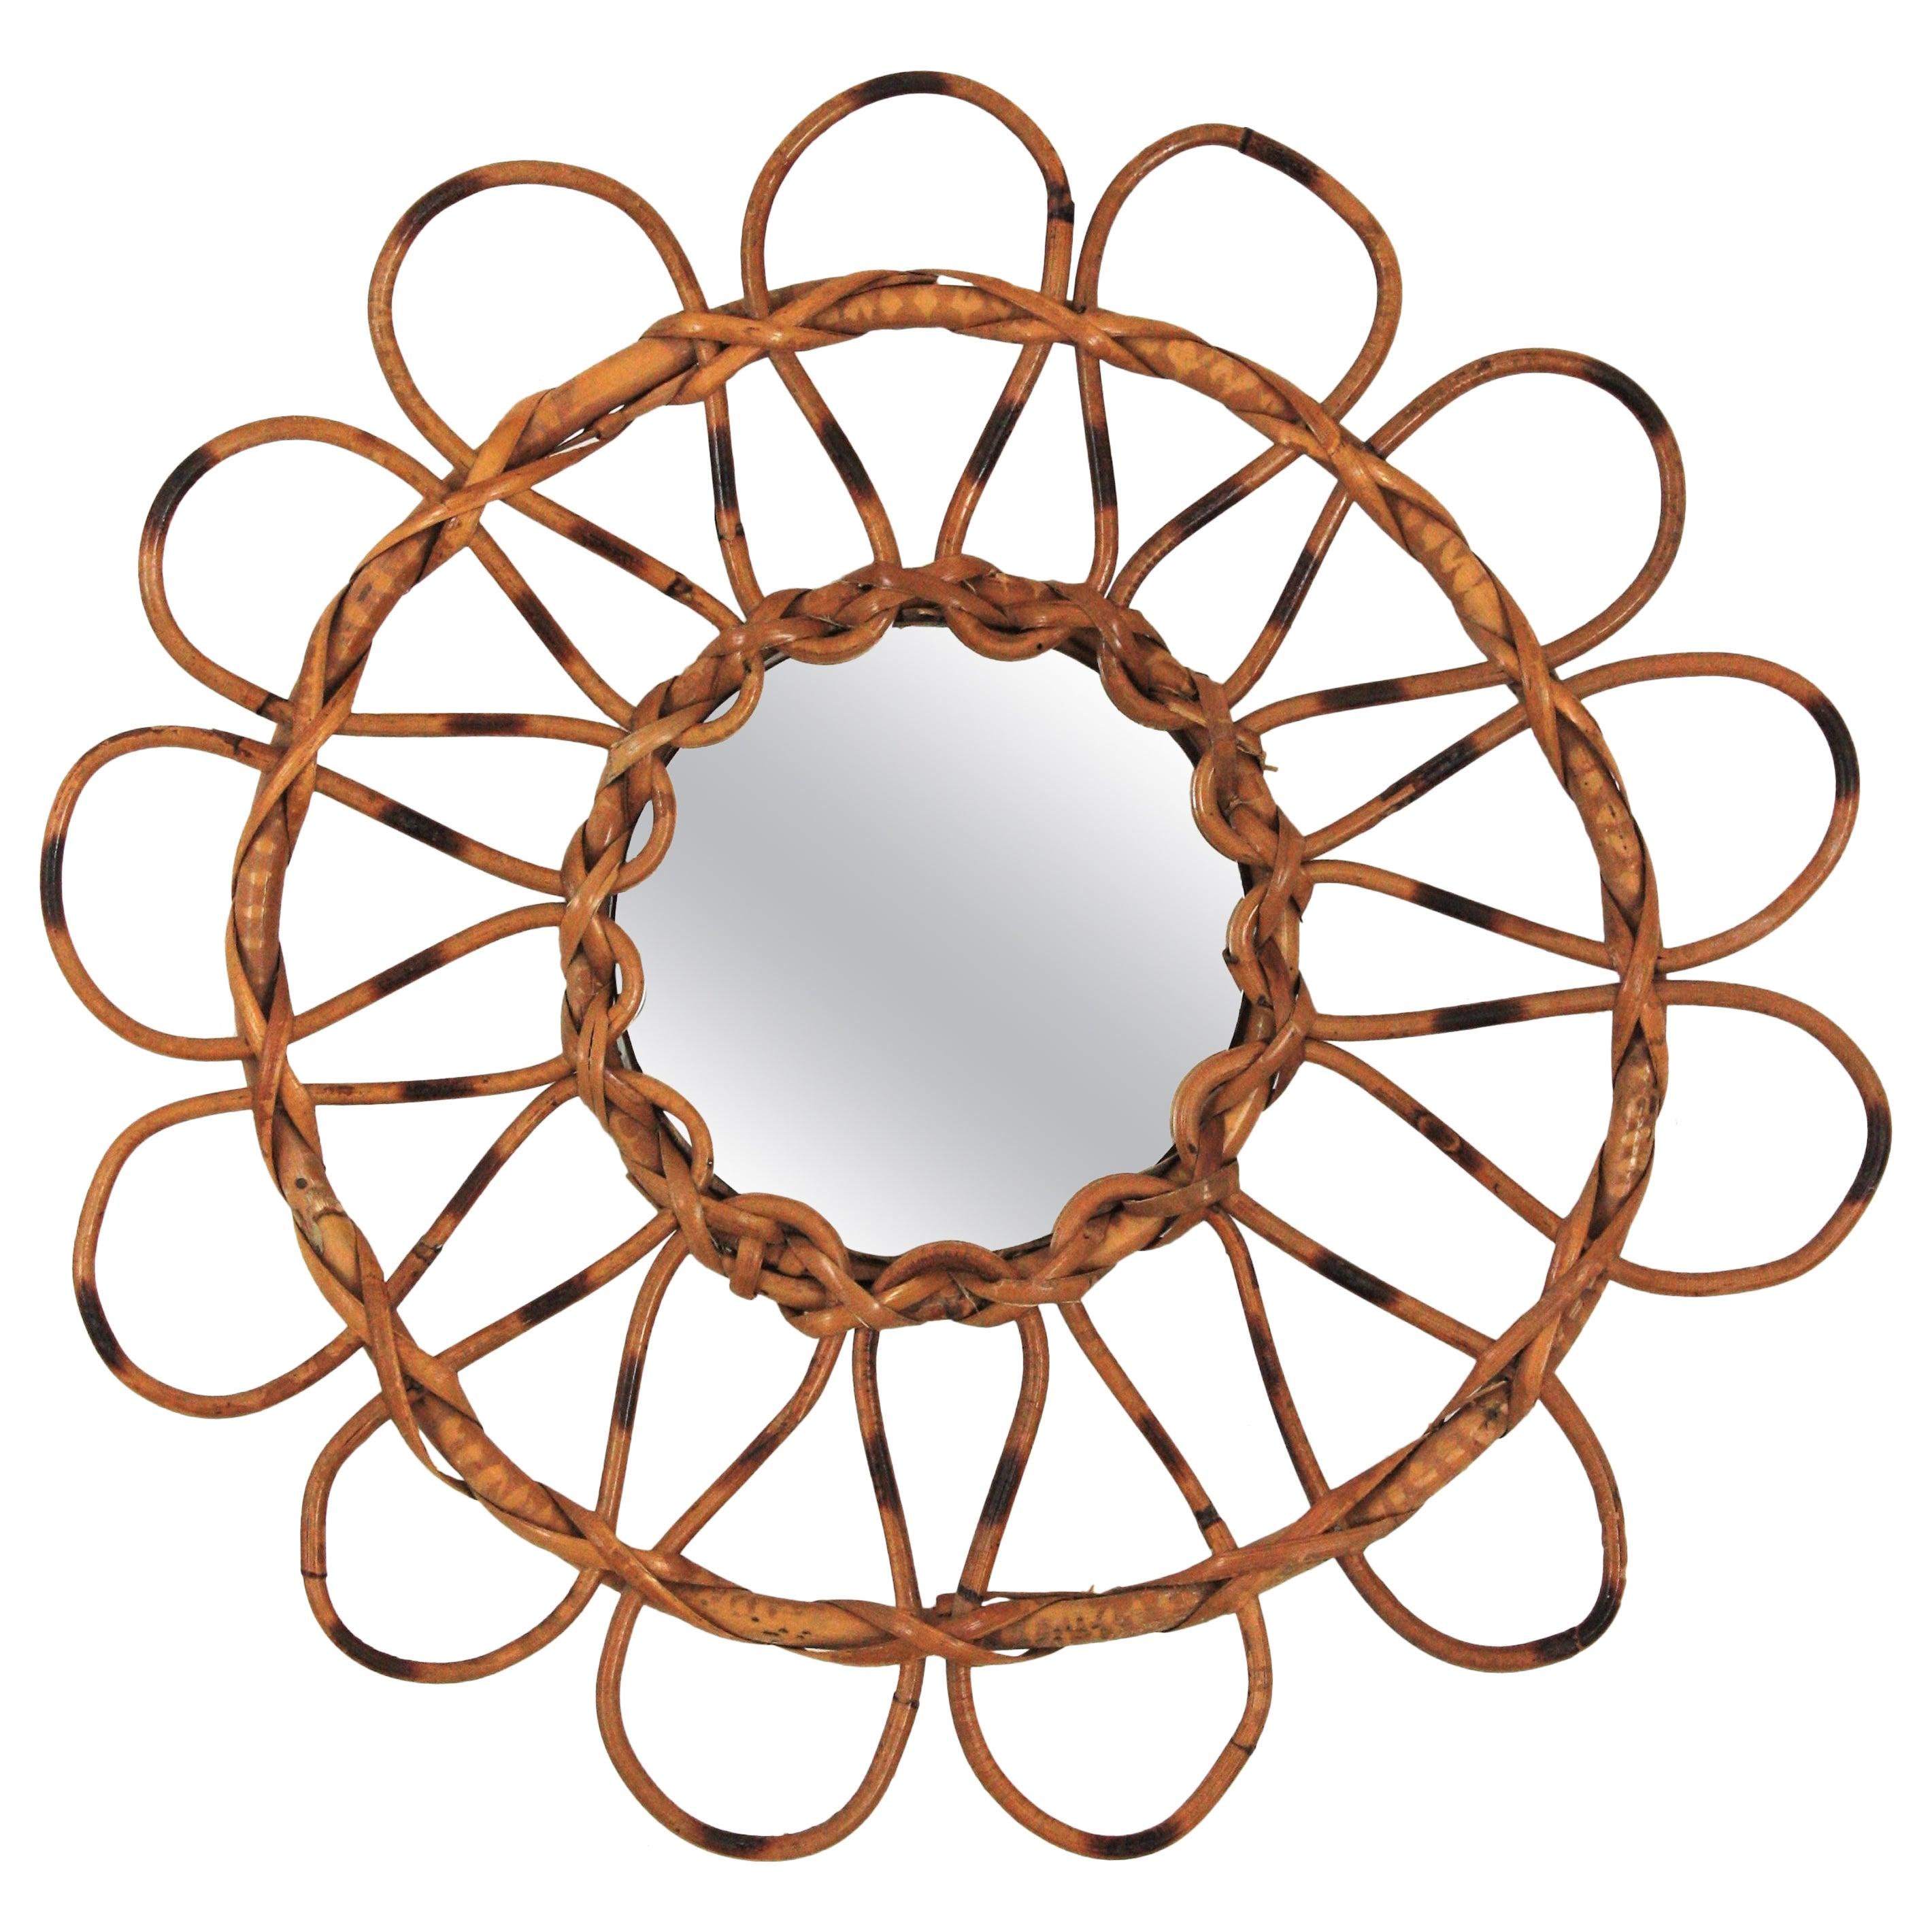 Rattan Sunburst Flower-Shaped Mirror